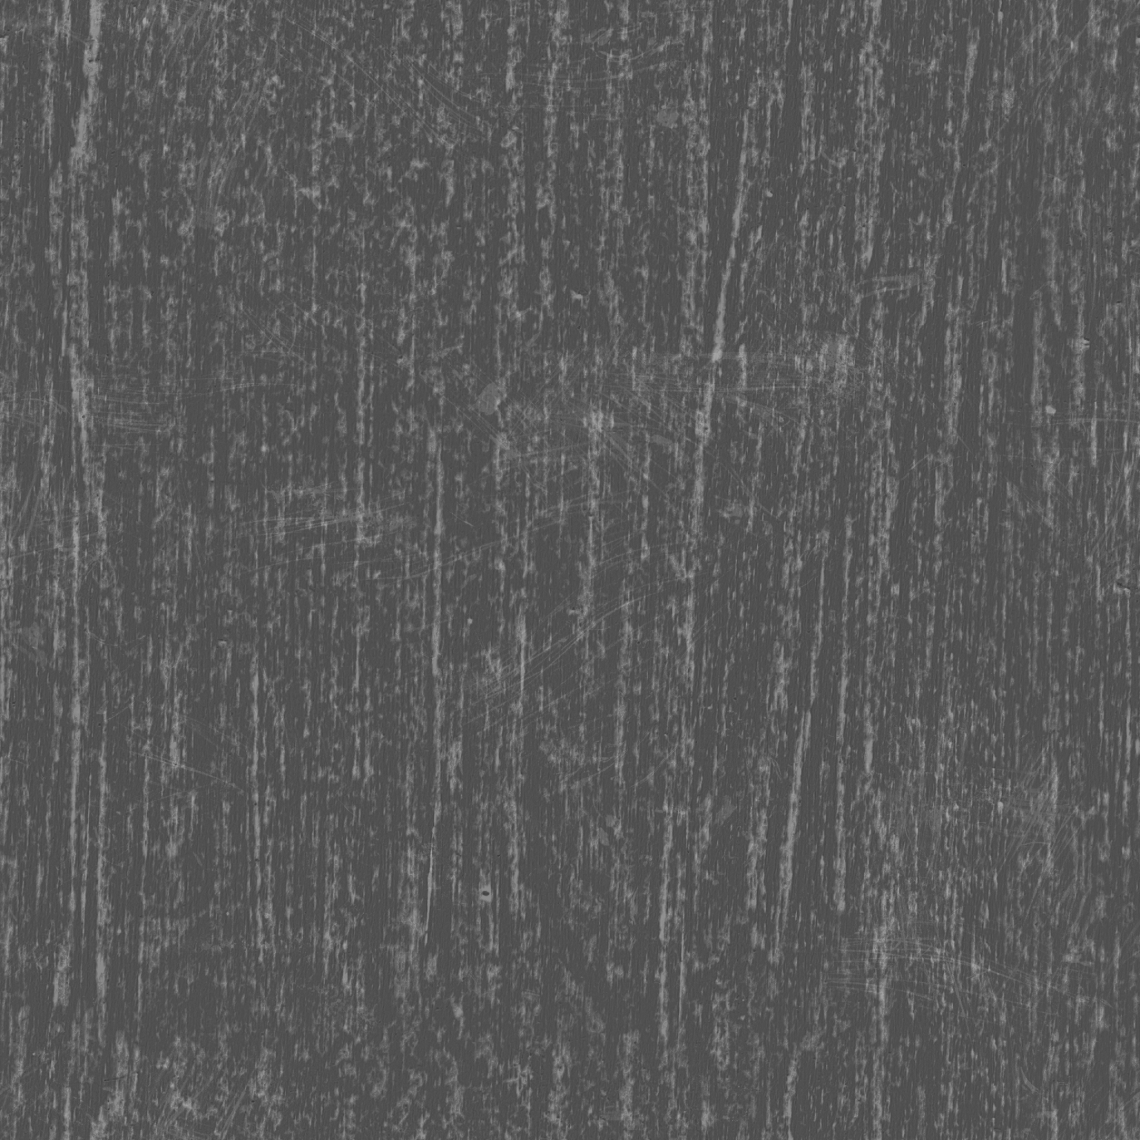 Wood-Plain-03-roughness